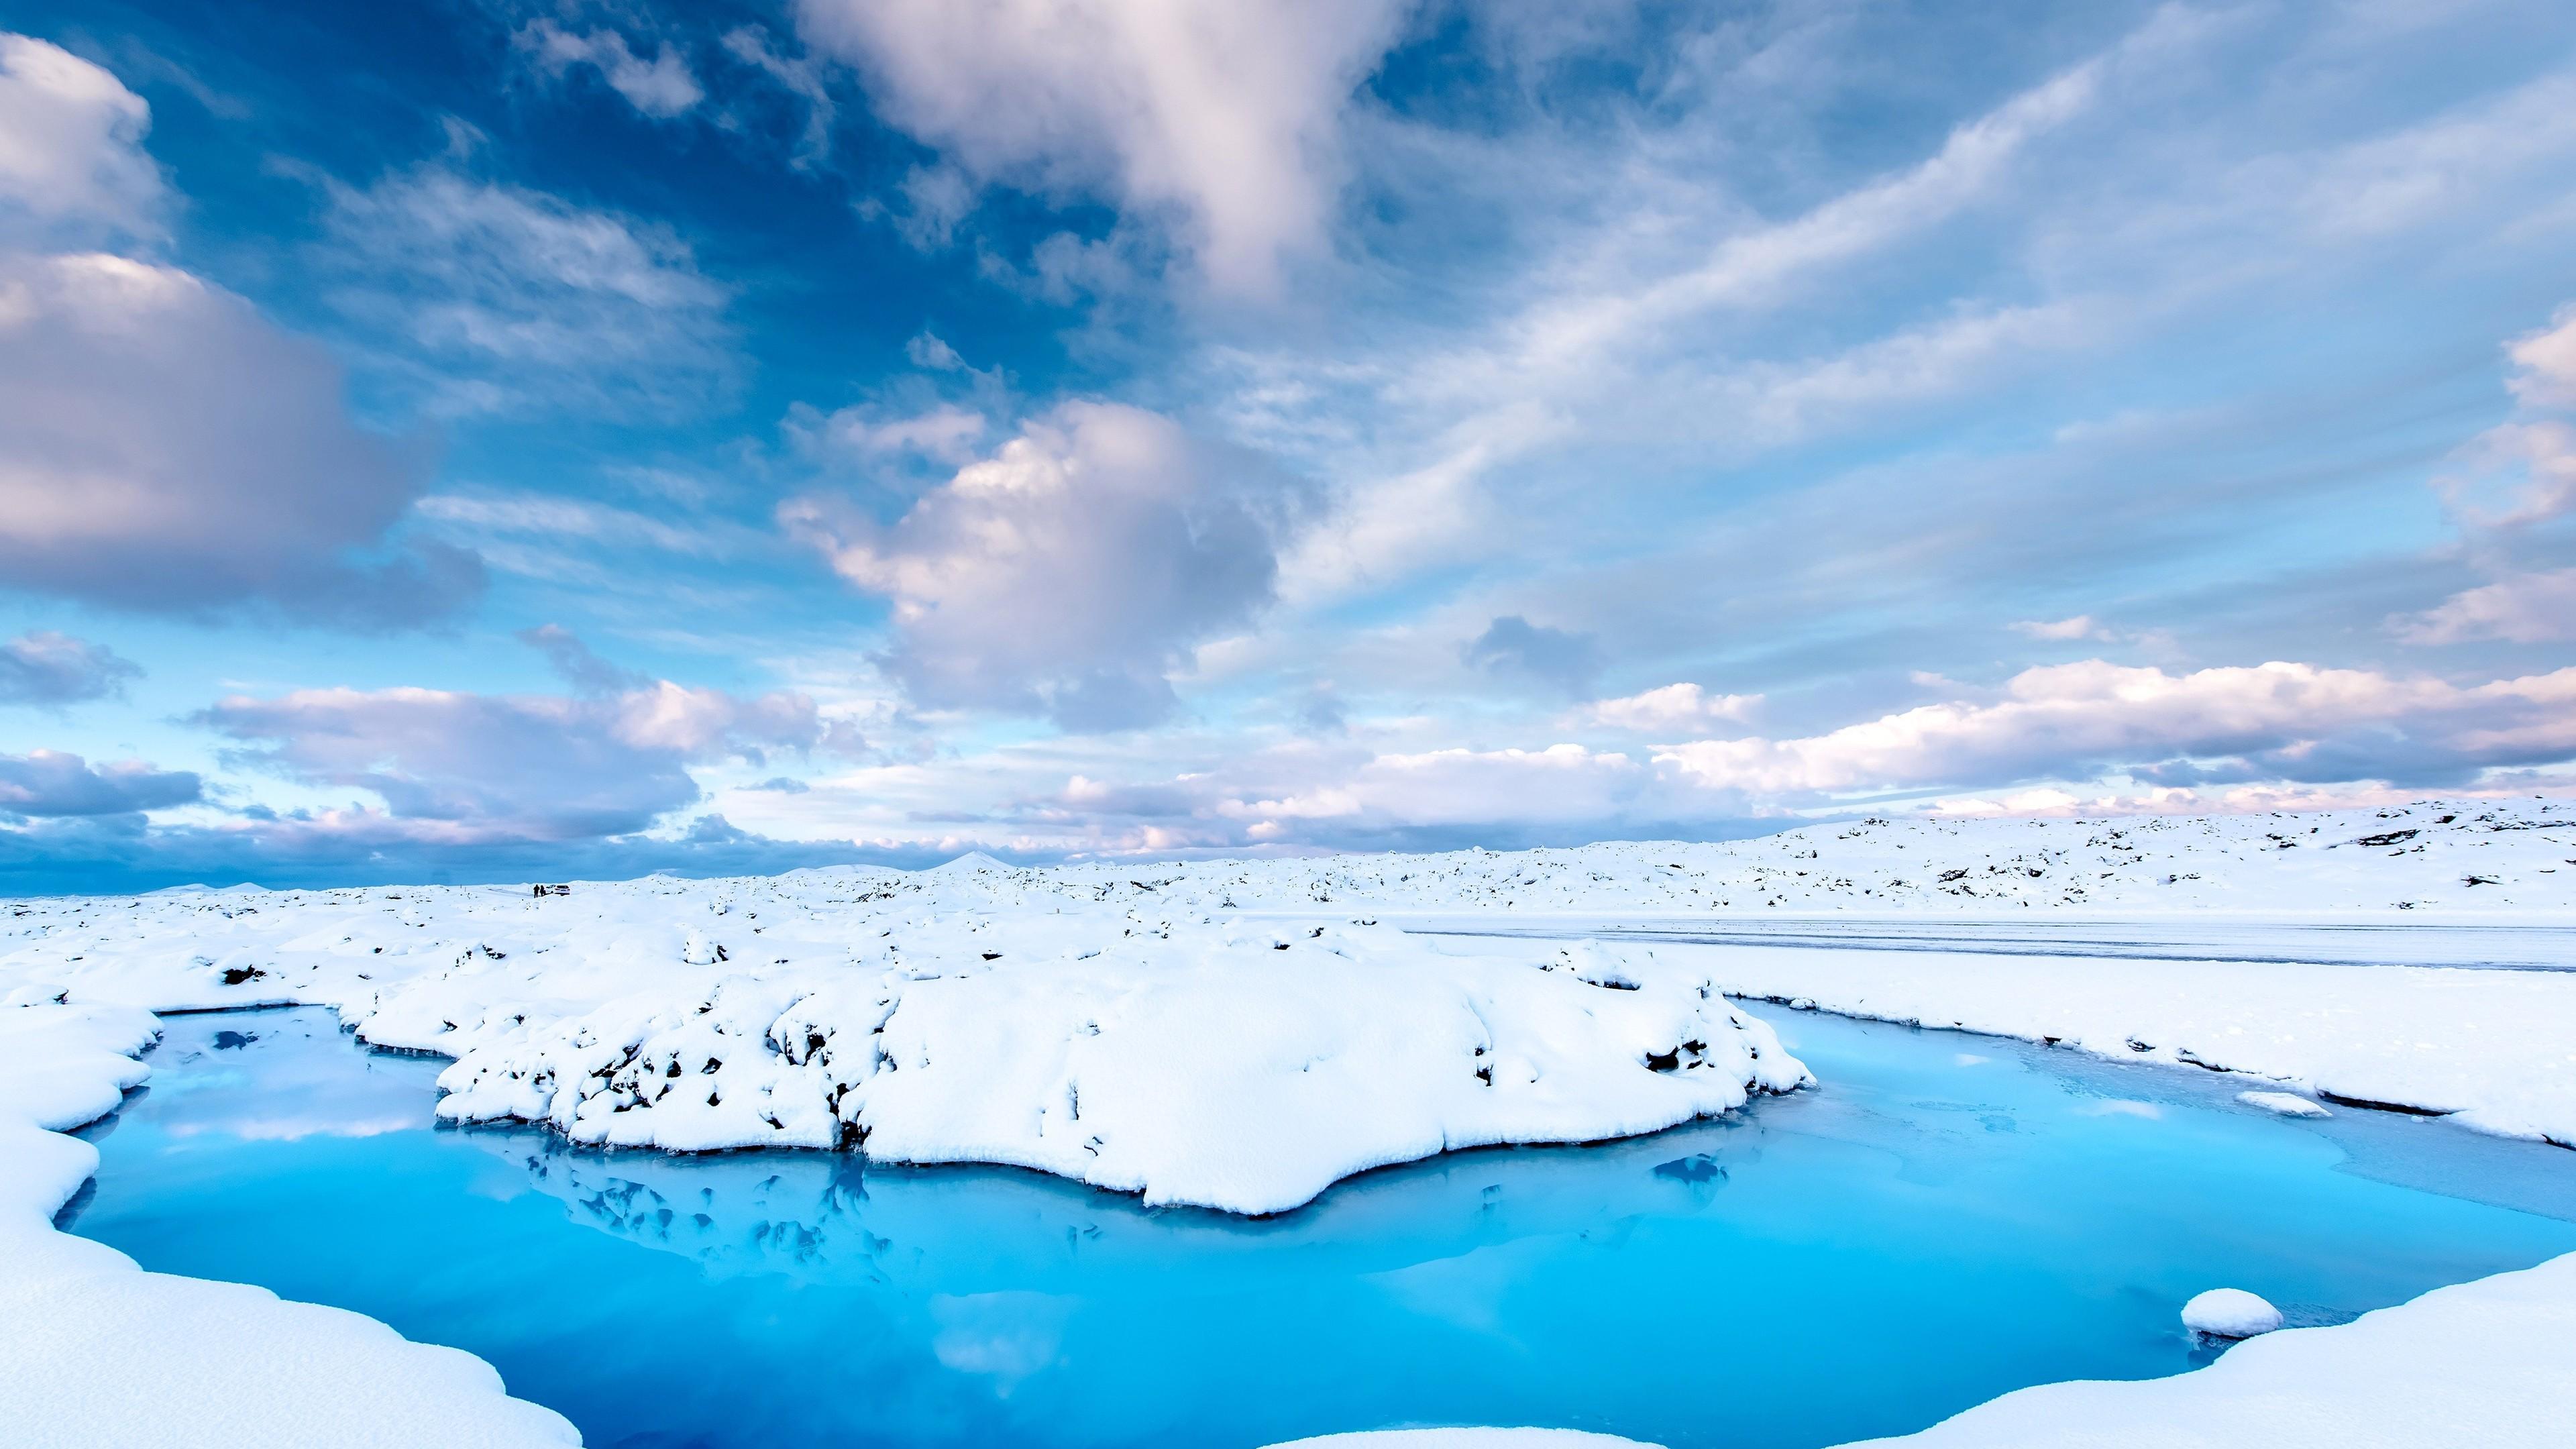 iceland snow water 4k 1540132903 - Iceland Snow Water 4k - water wallpapers, snow wallpapers, nature wallpapers, iceland wallpapers, hd-wallpapers, 5k wallpapers, 4k-wallpapers